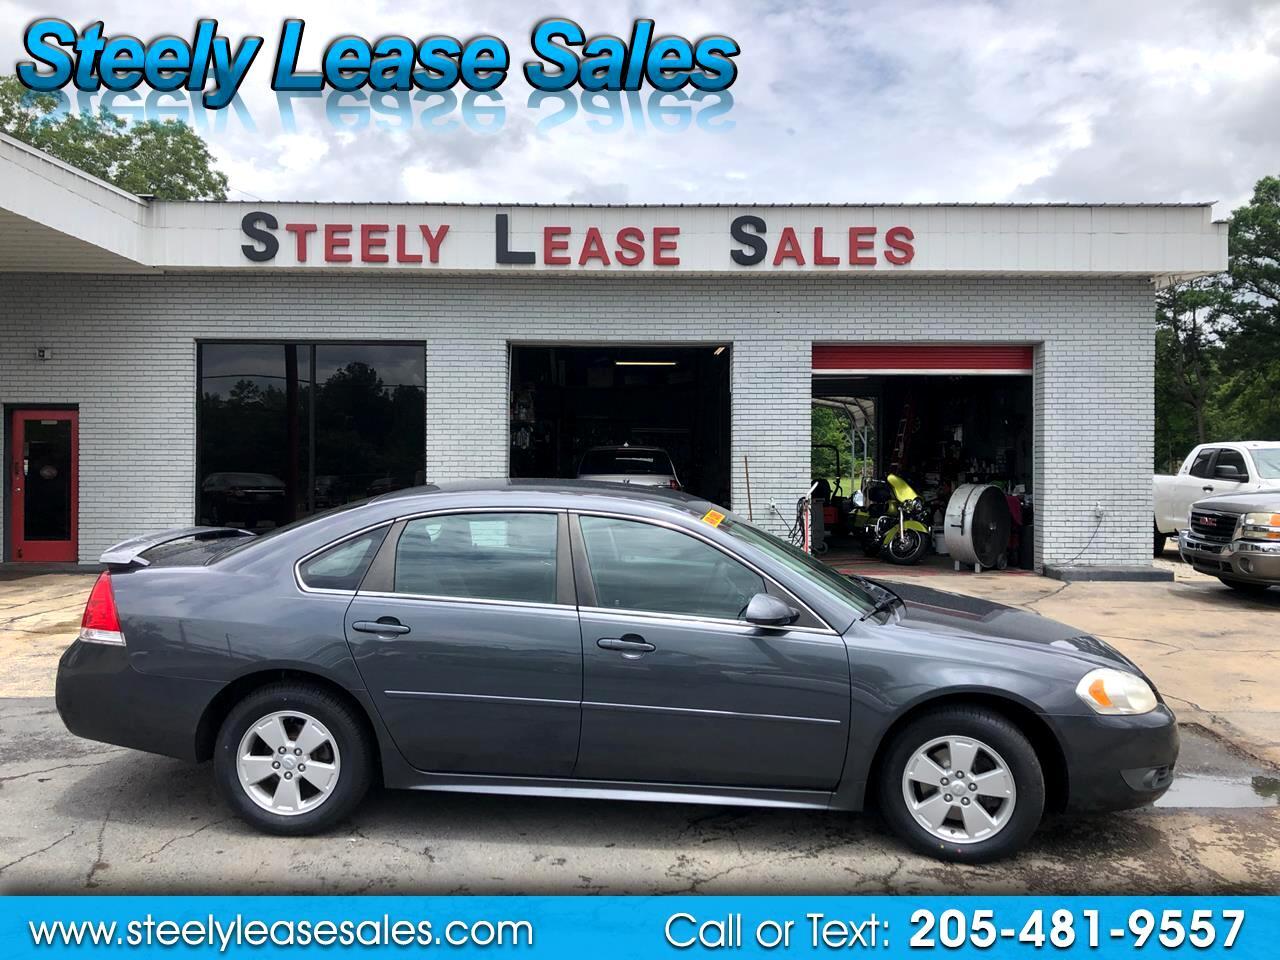 Chevrolet Impala 4dr Sdn LT 2010